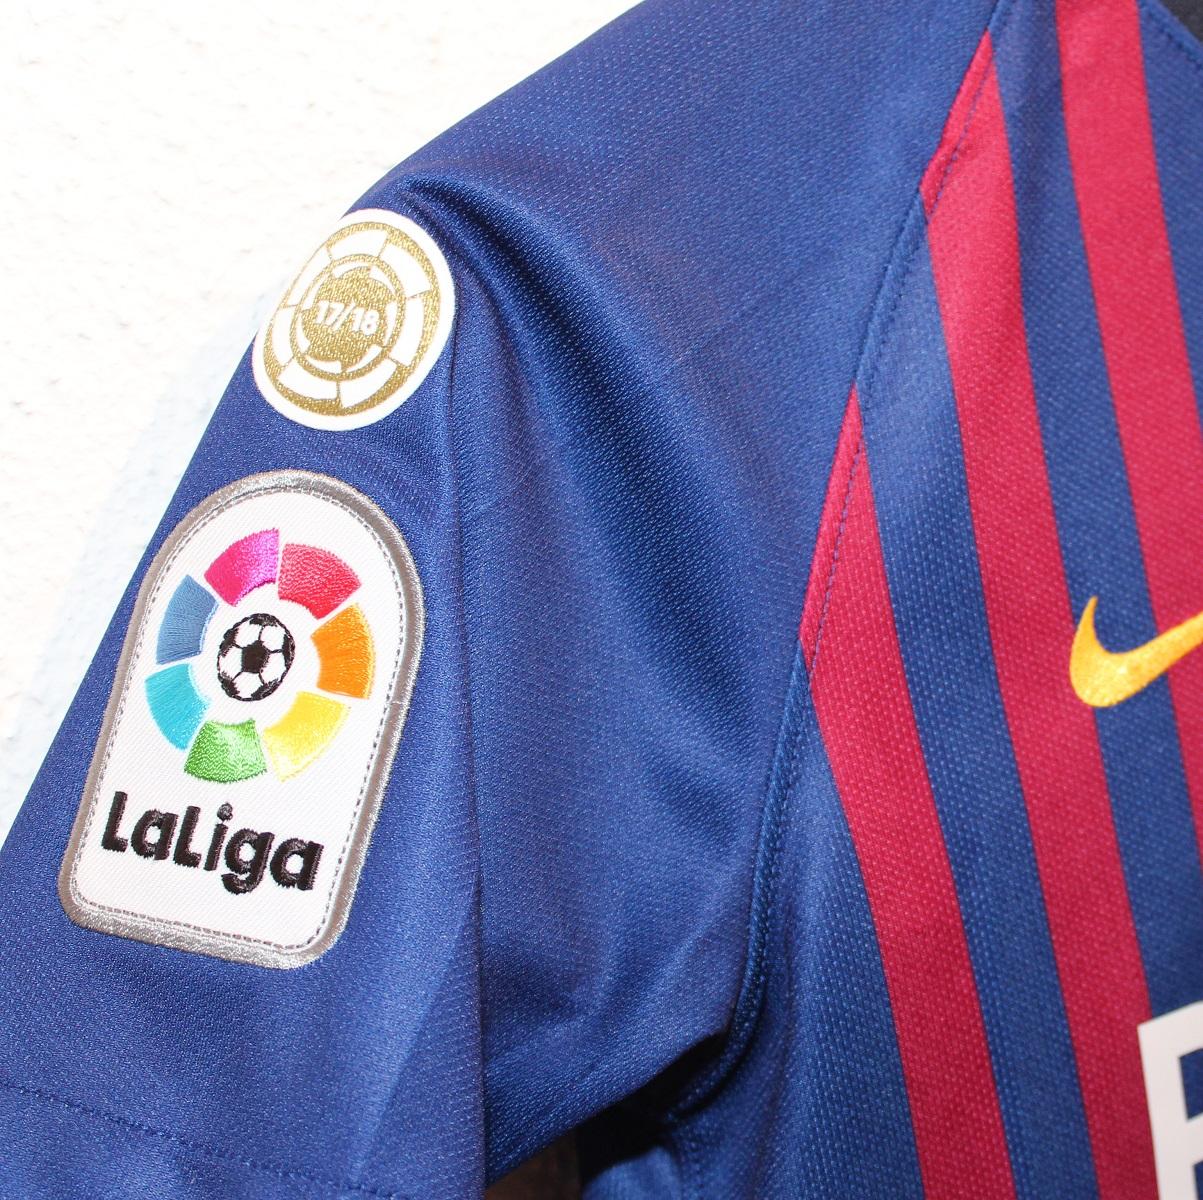 Barca champs badge 17/18